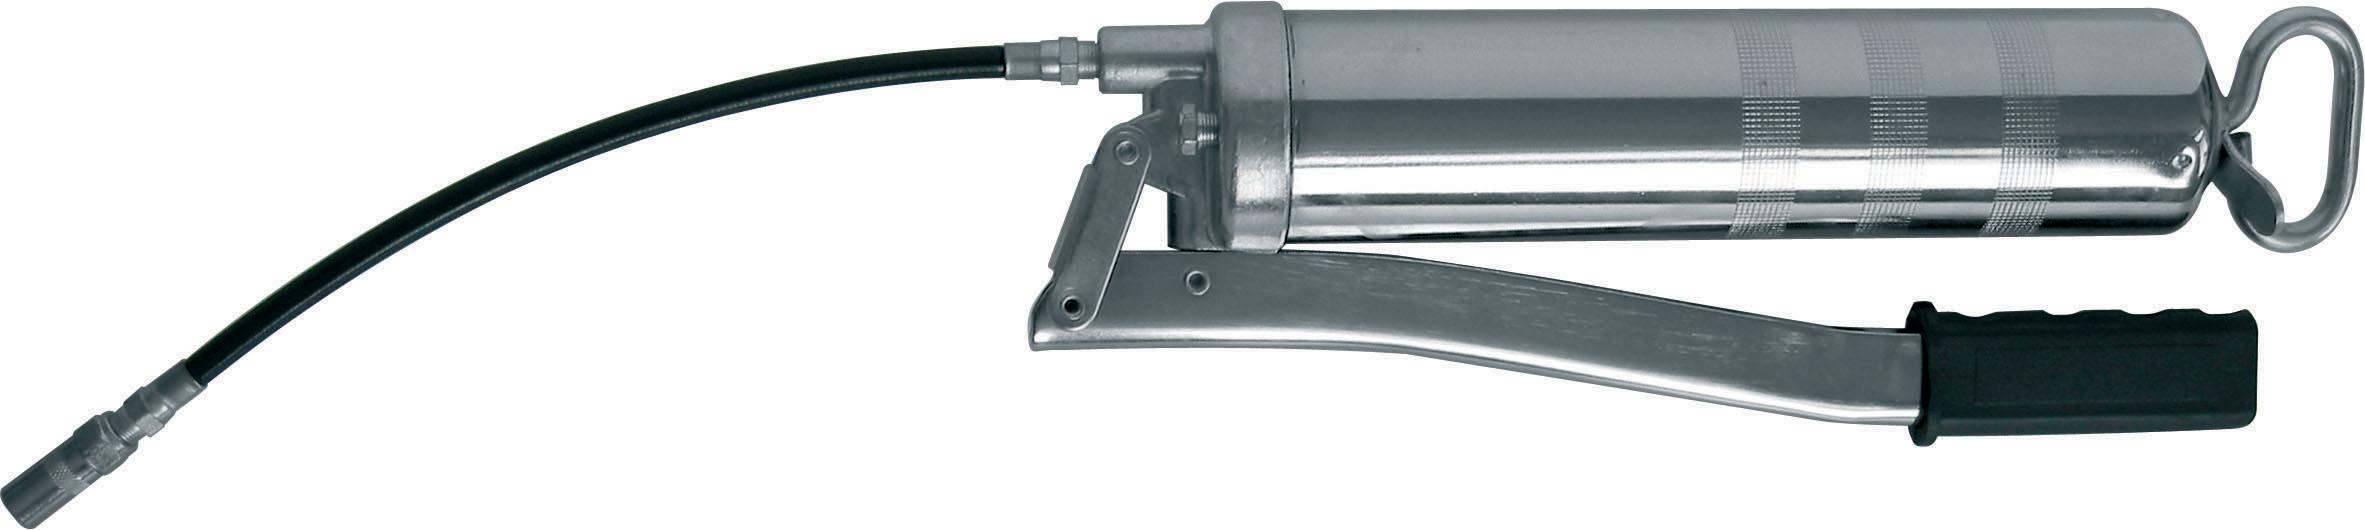 52s2r_grease-gun-pompamanB.jpg